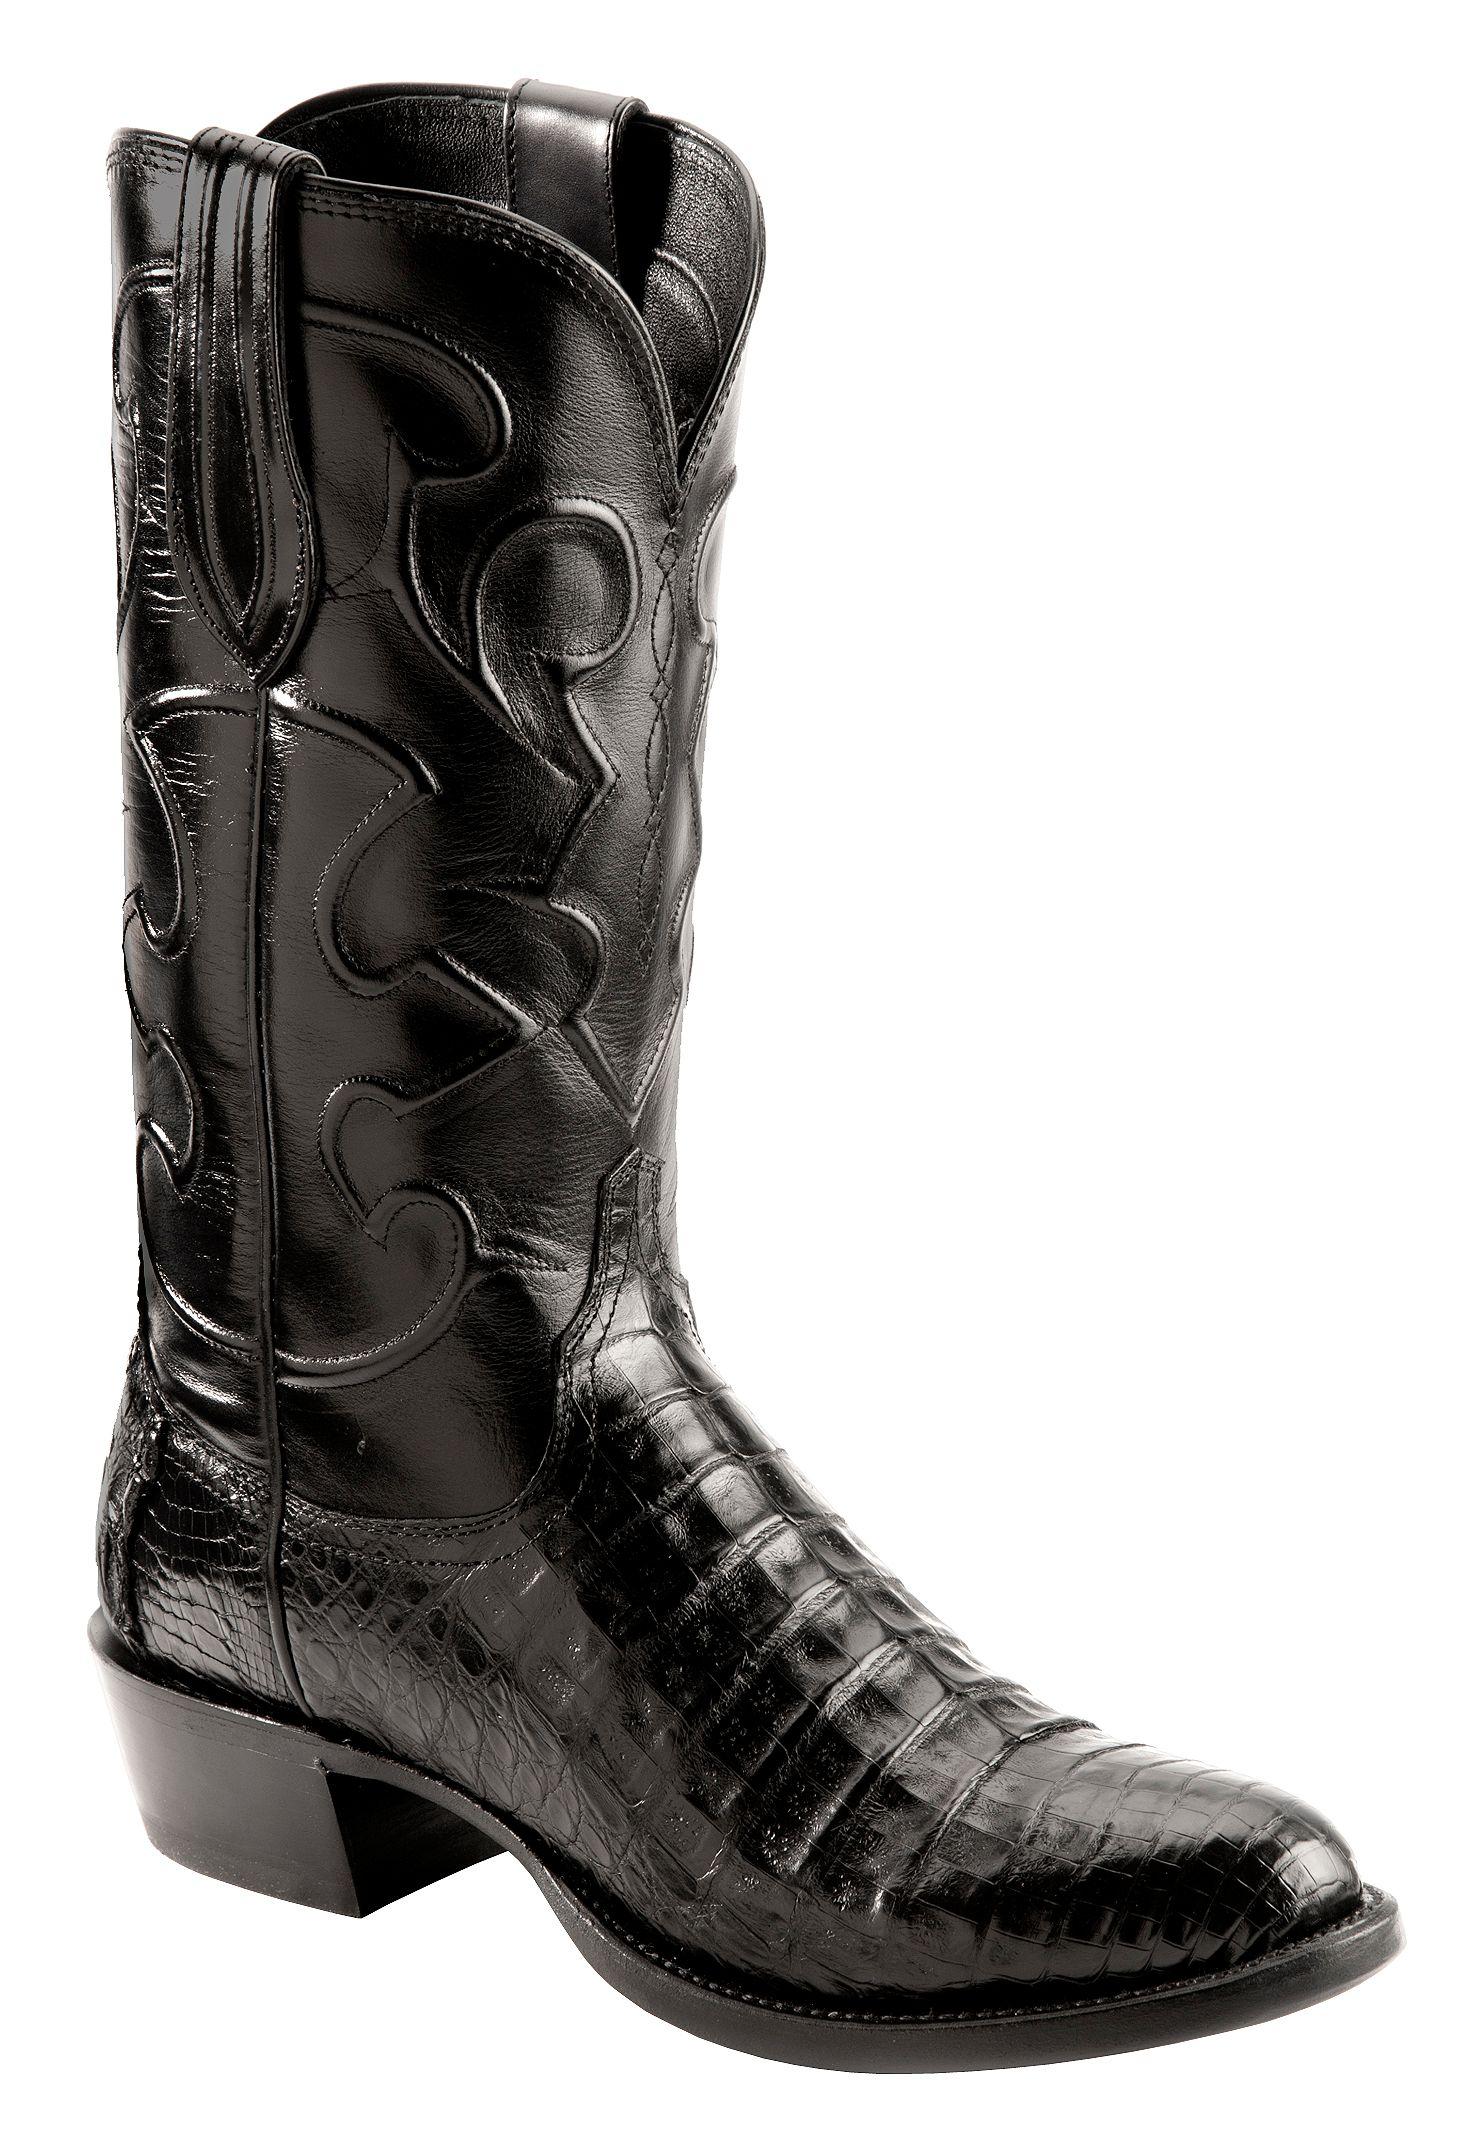 Wonderful Lucchese Womens Sierra Espresso Calf Boots M4841 - Cowboy Shop - Cowboy Shop